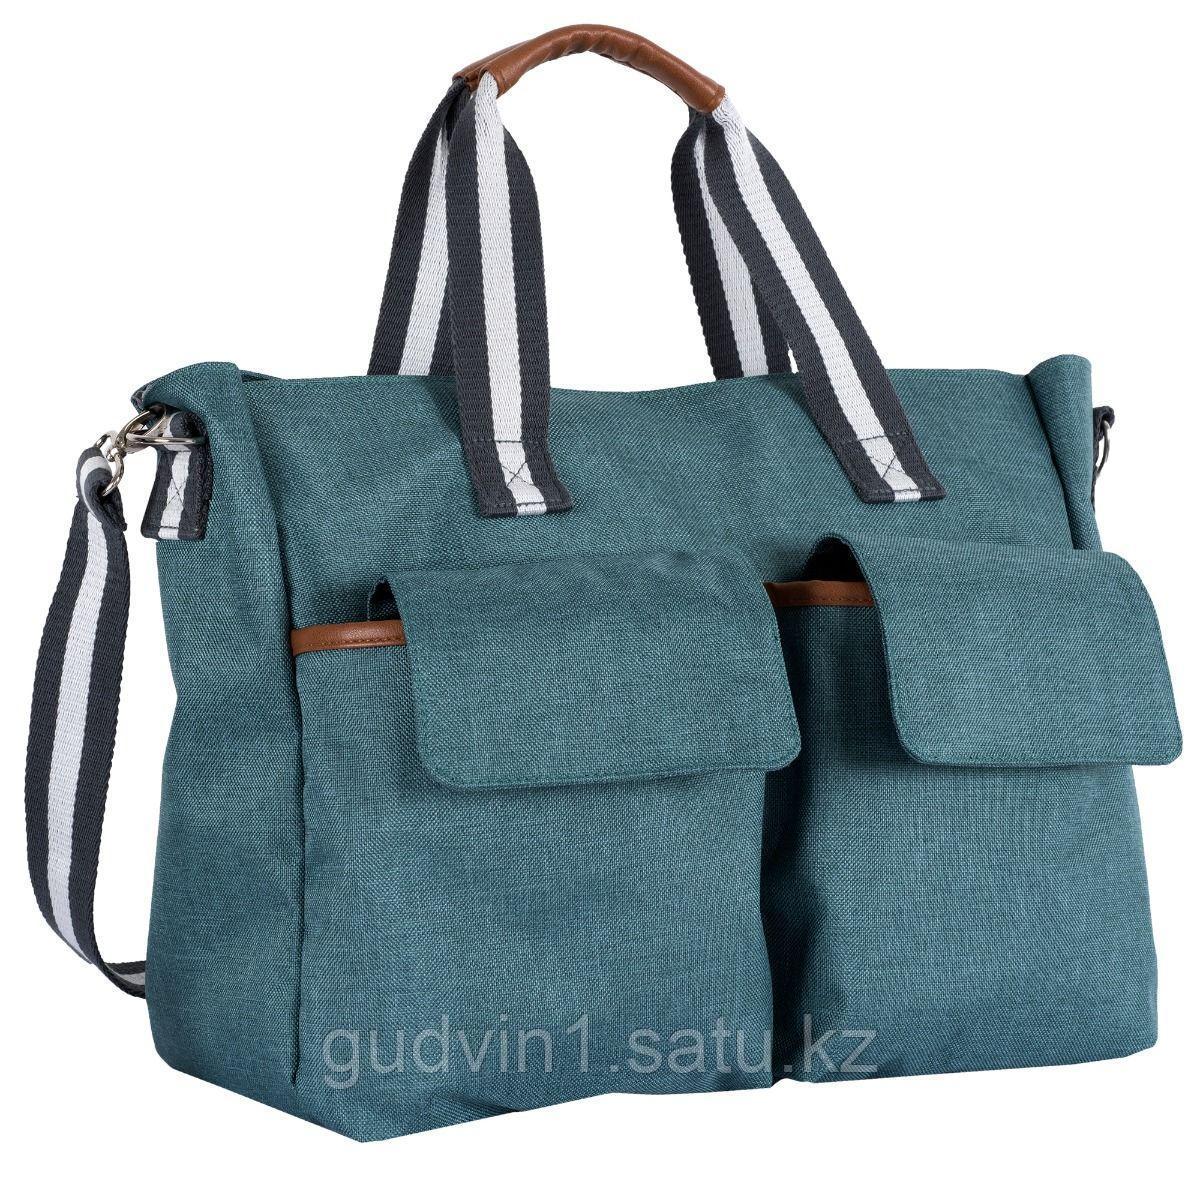 Chicco: Дорожная сумка для мамы Water repellent зел. код: 1123564